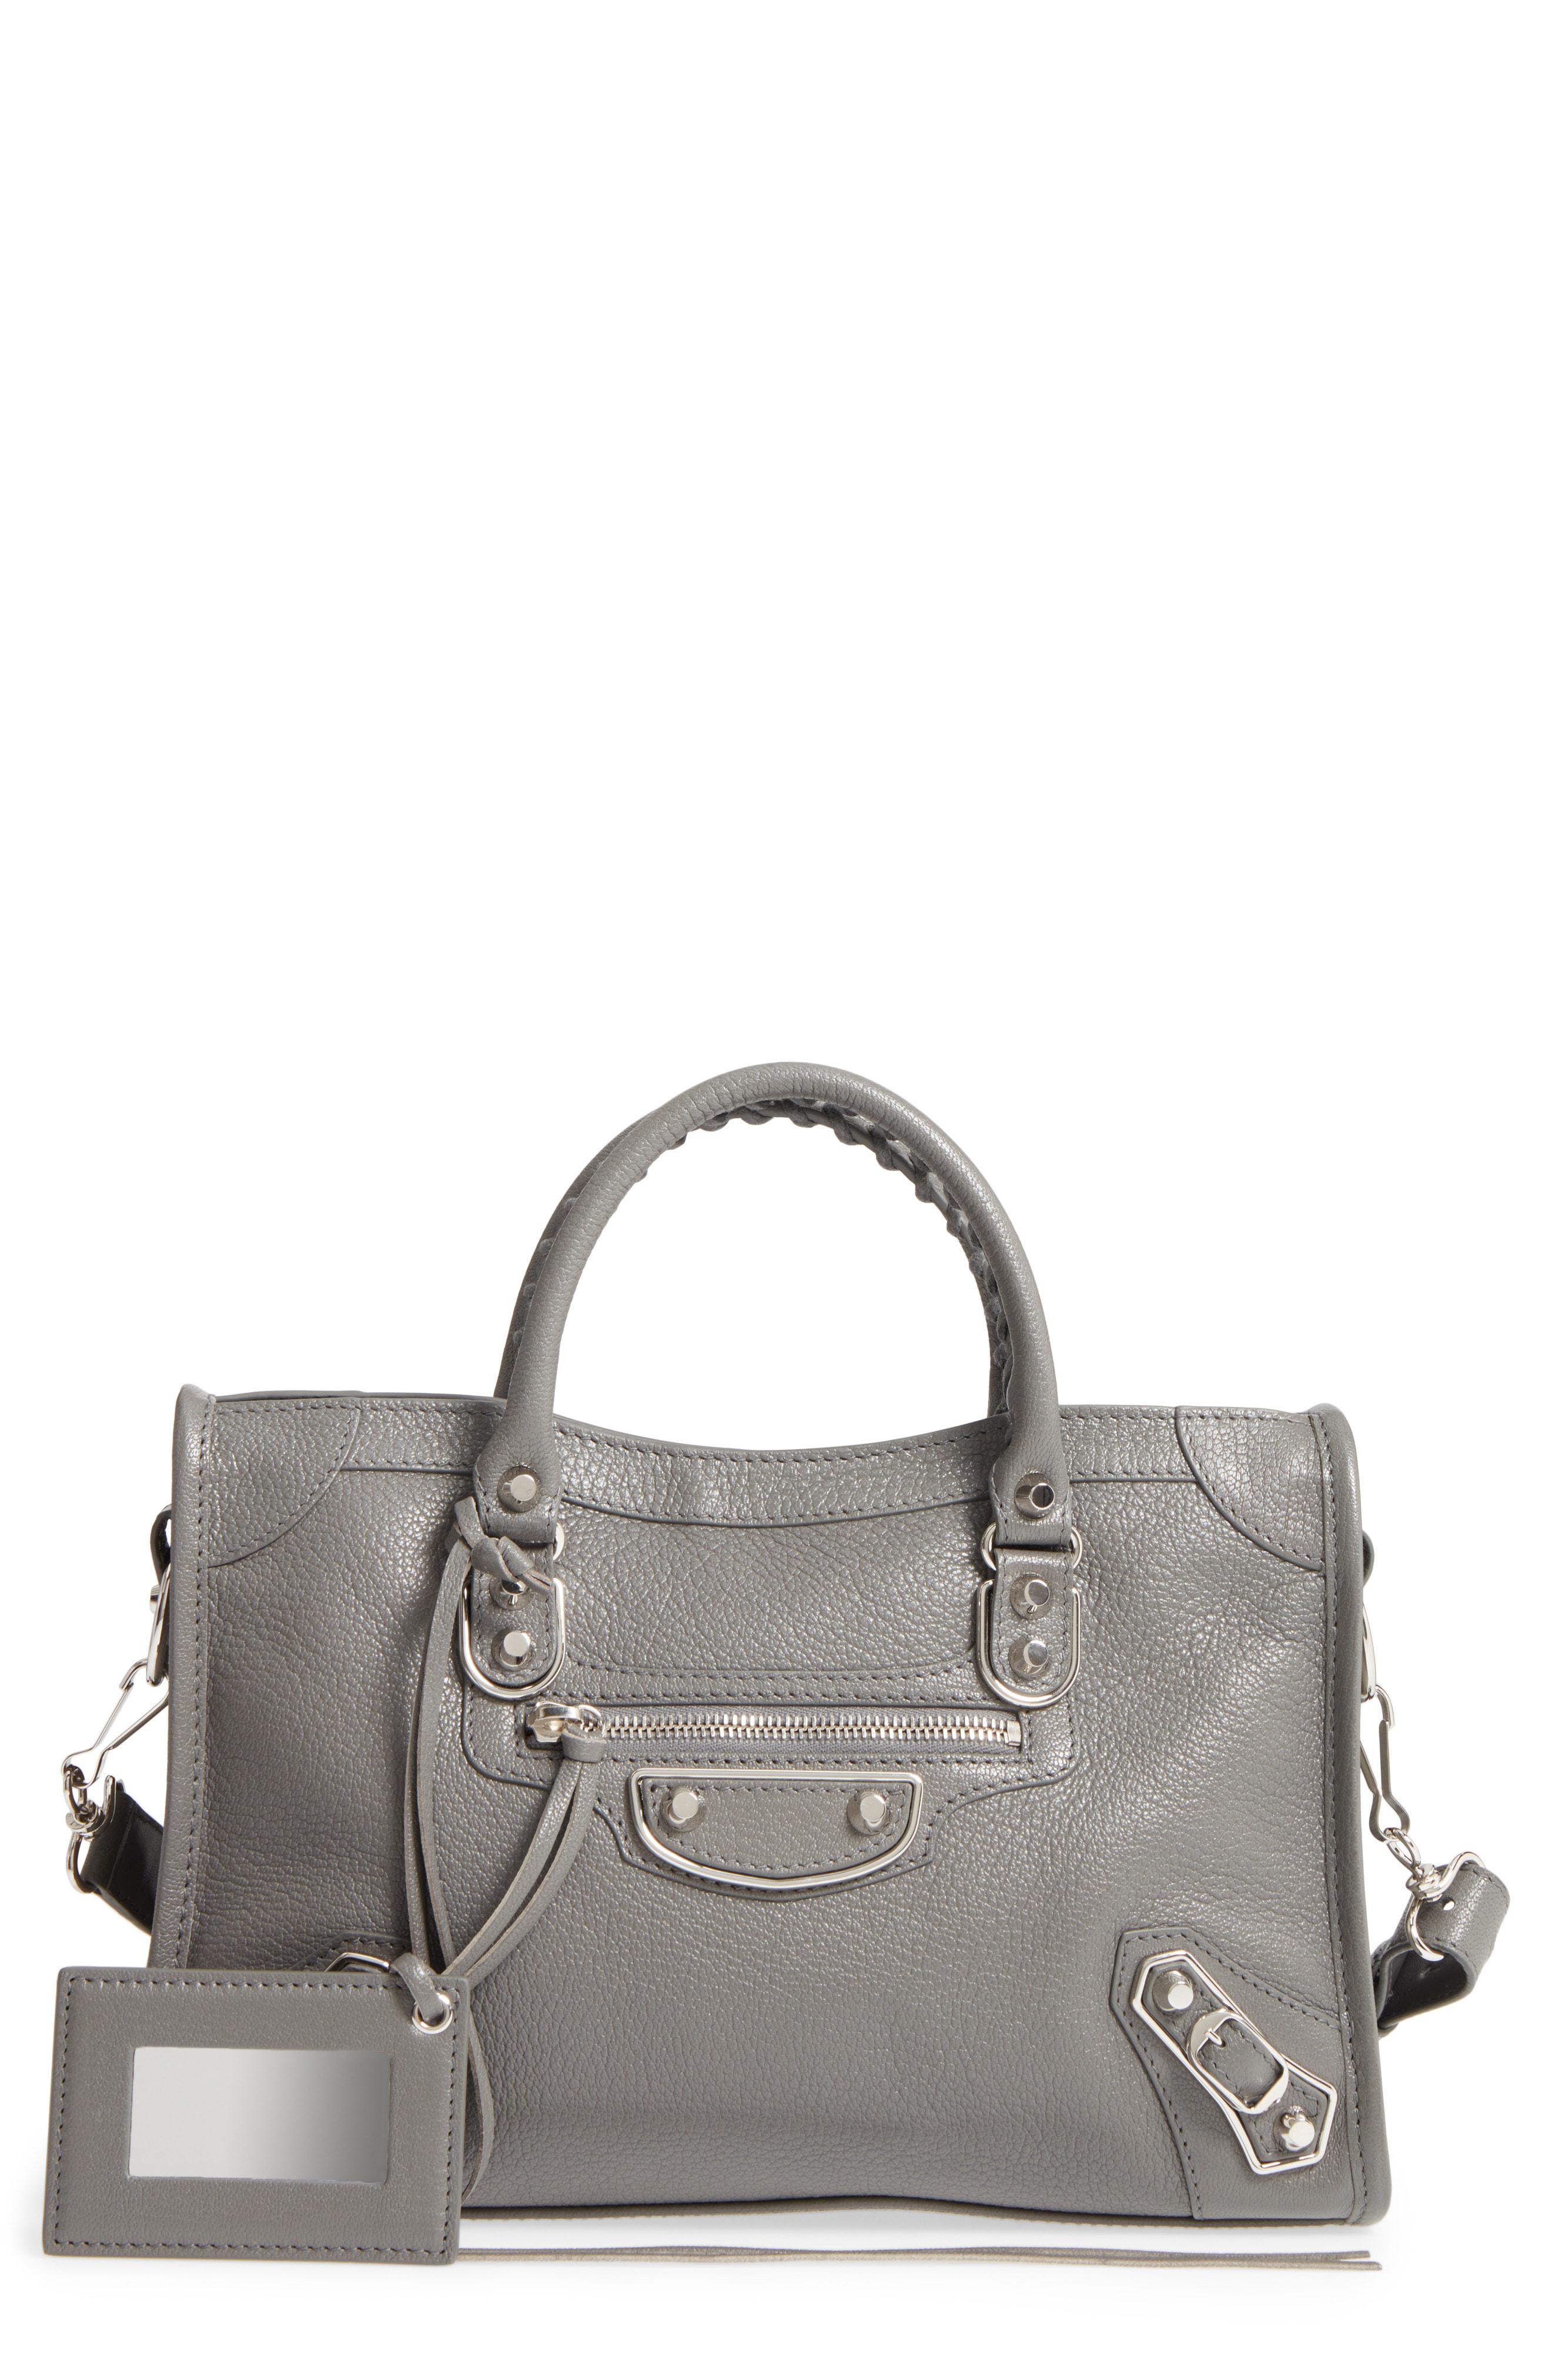 9c4421fbb801 Balenciaga Small Classic Metallic Edge City Leather Tote - Grey In ...